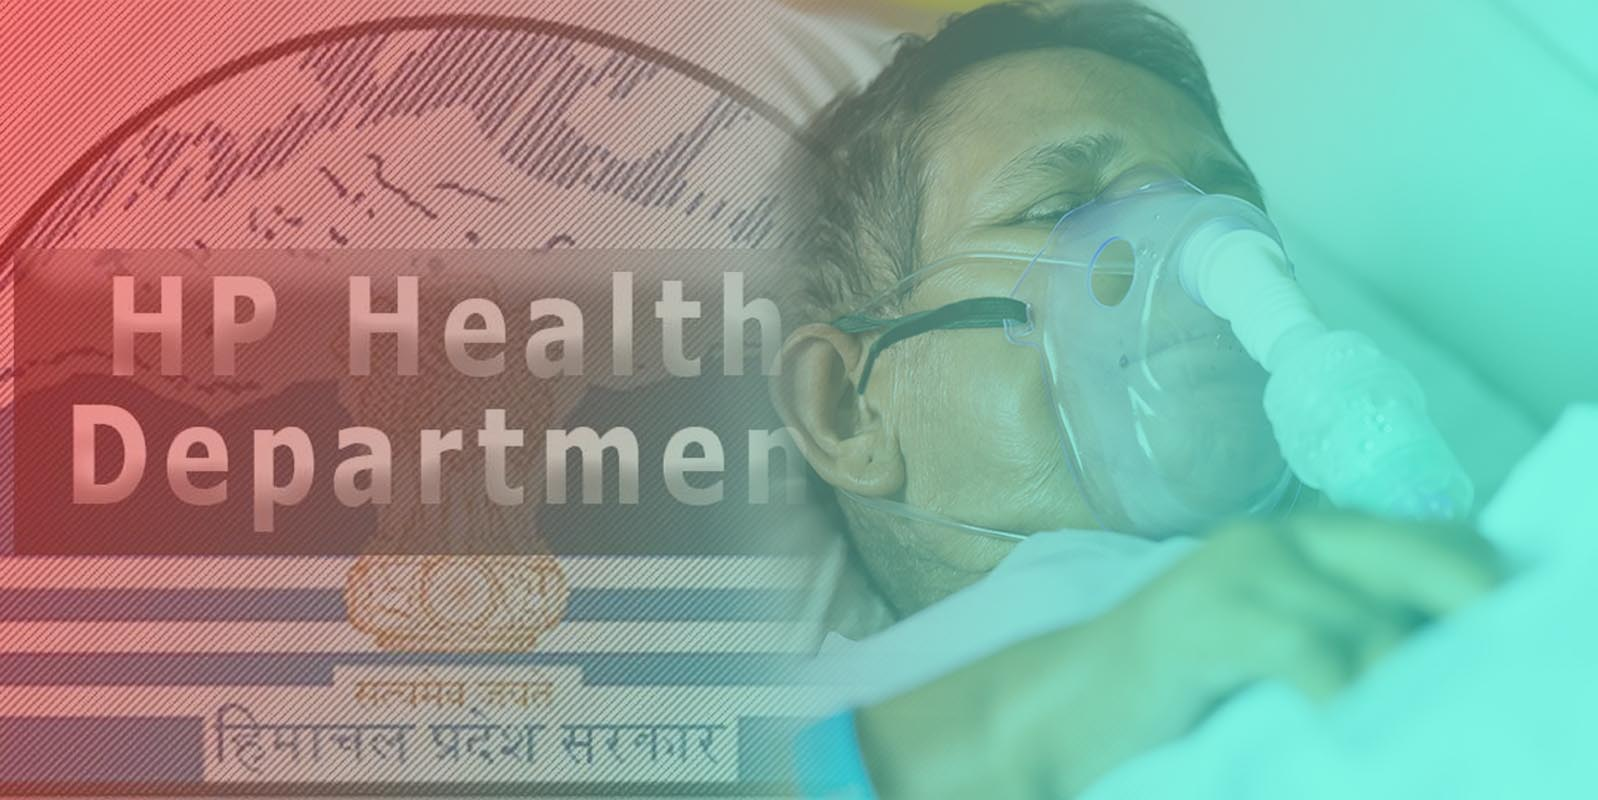 Himachal-Pradesh-Ventilator-scam